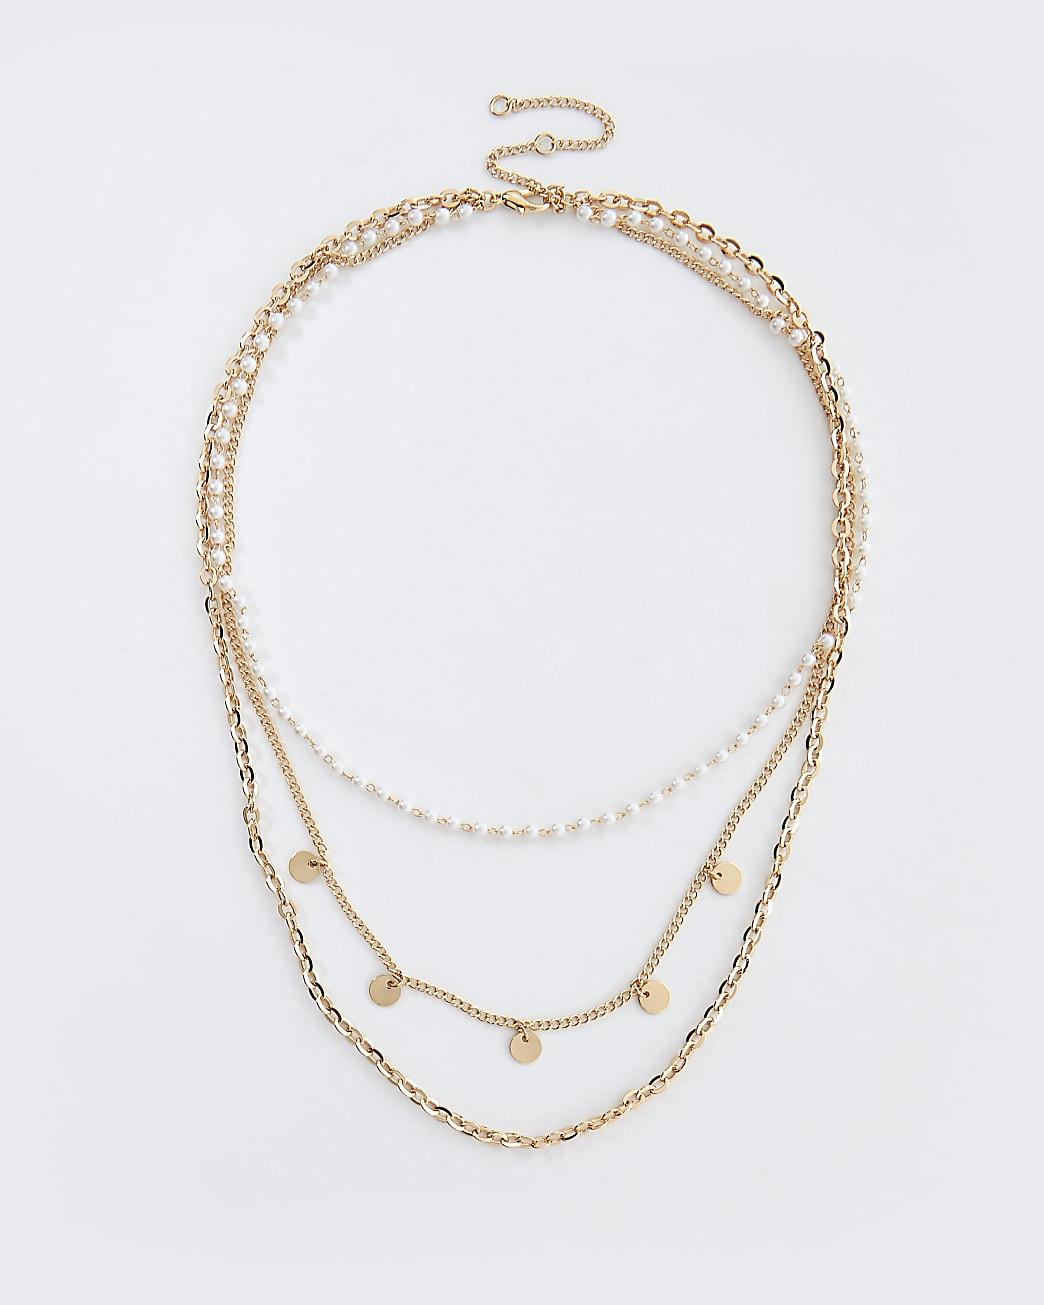 Gold and pearl layered choker